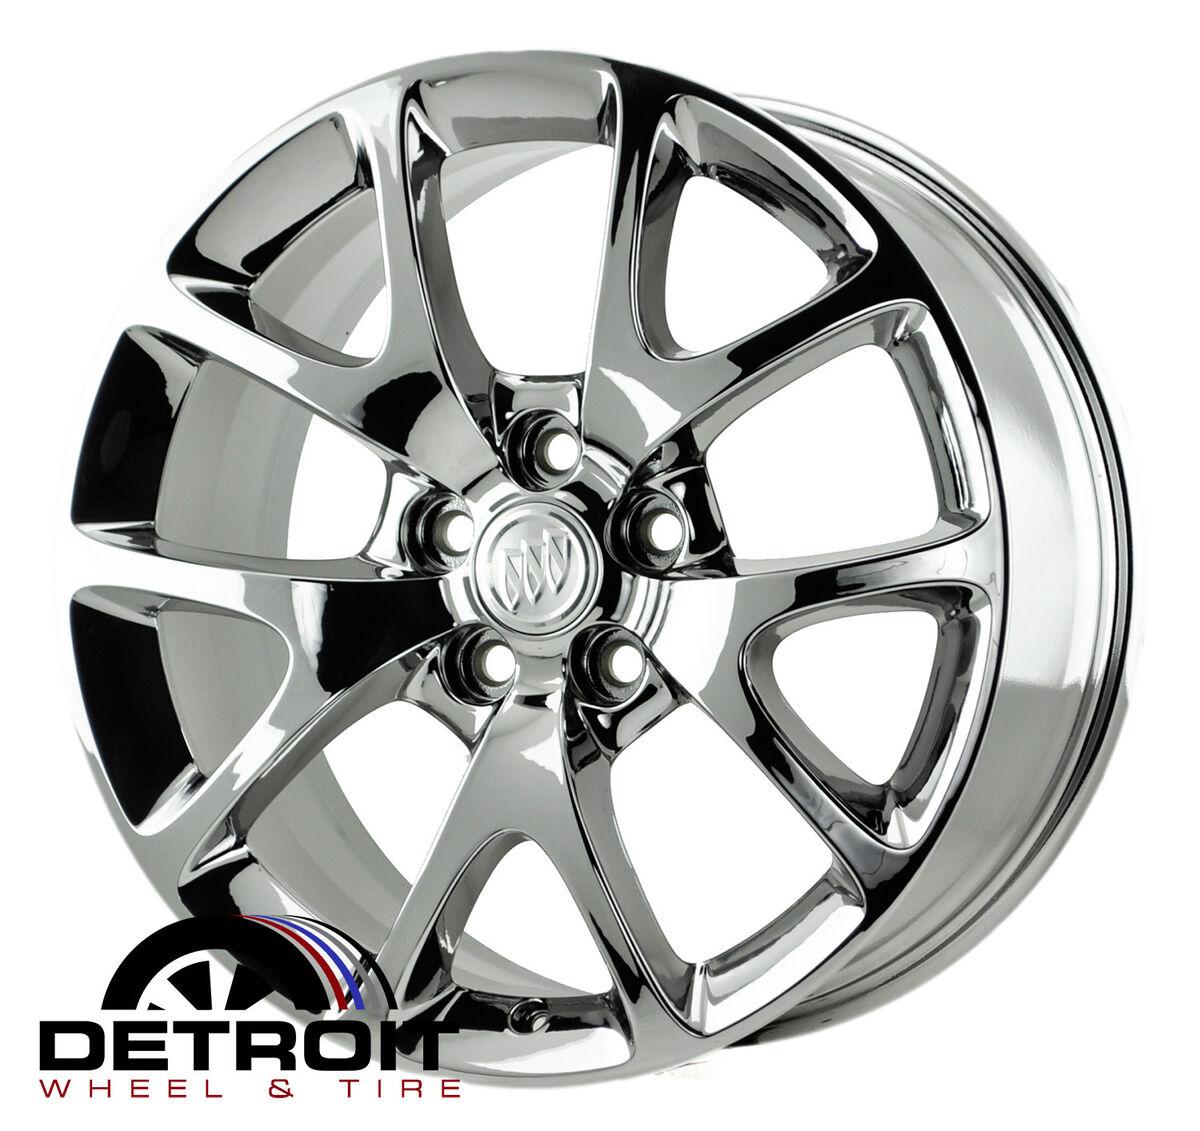 Buick Regal PVD Bright Chrome Wheels Factory Rim 4108 Exchange 2011 2013